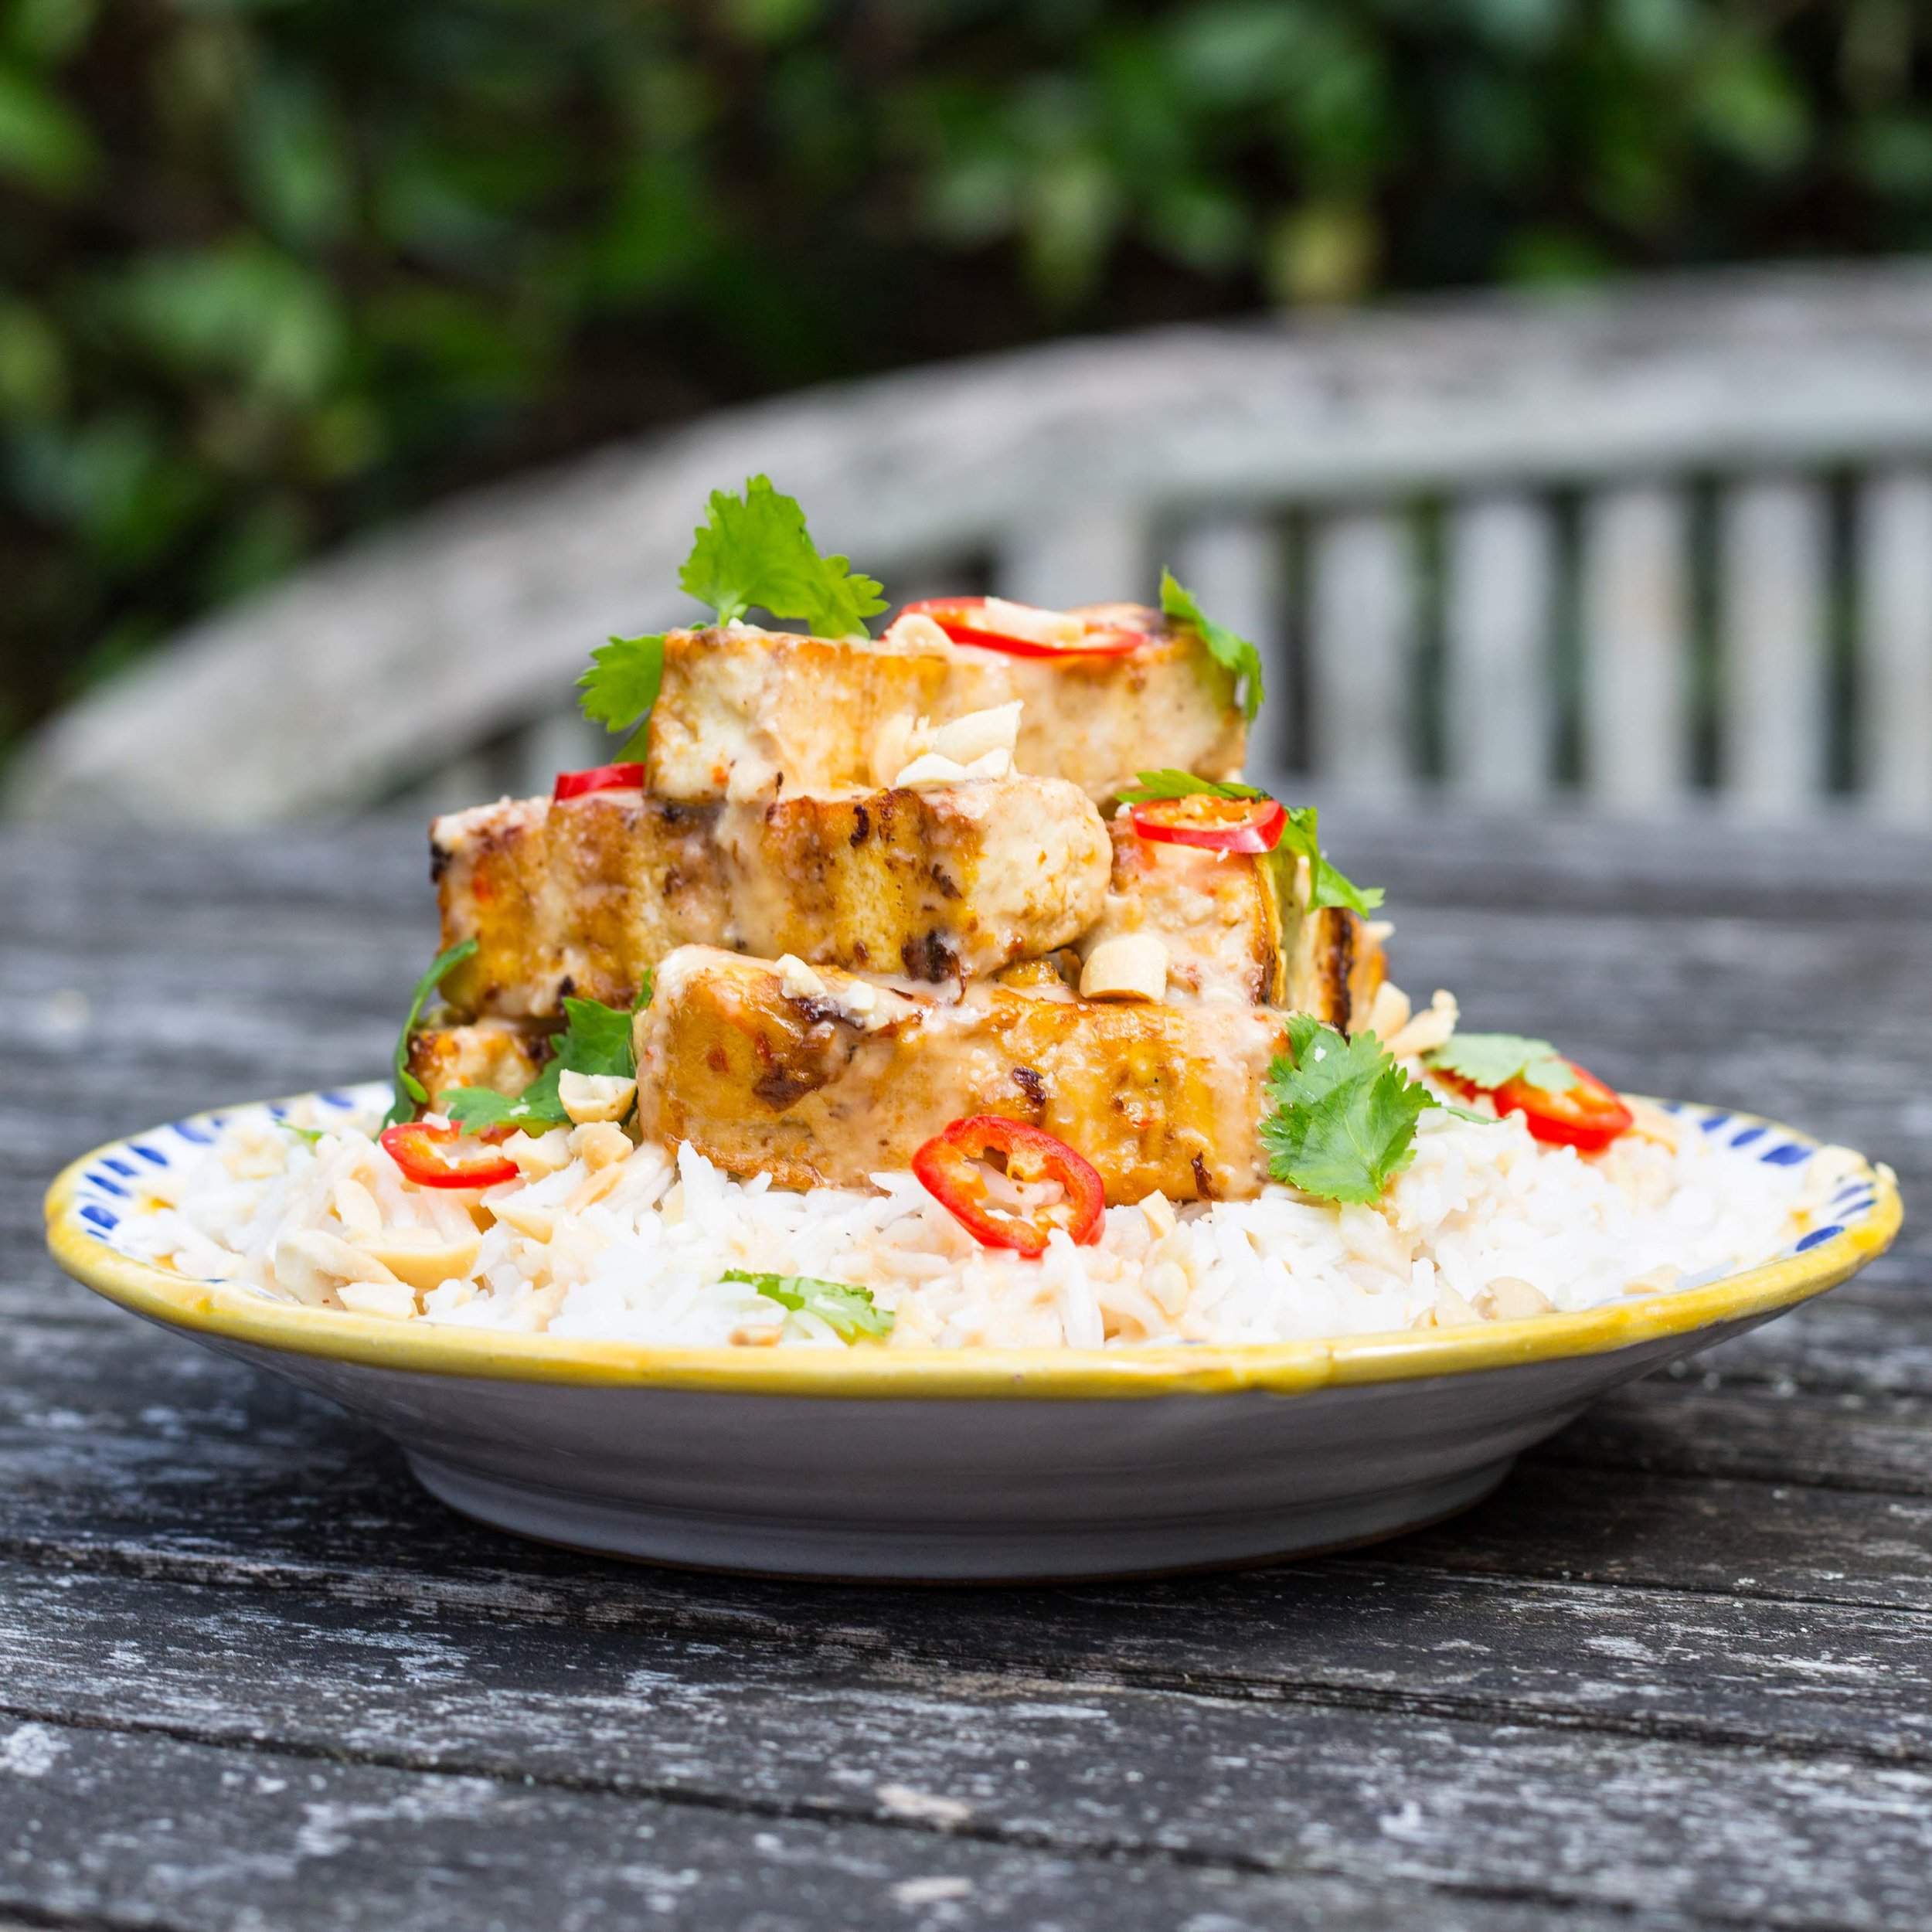 Peanut Butter Tofu Image 1.jpg